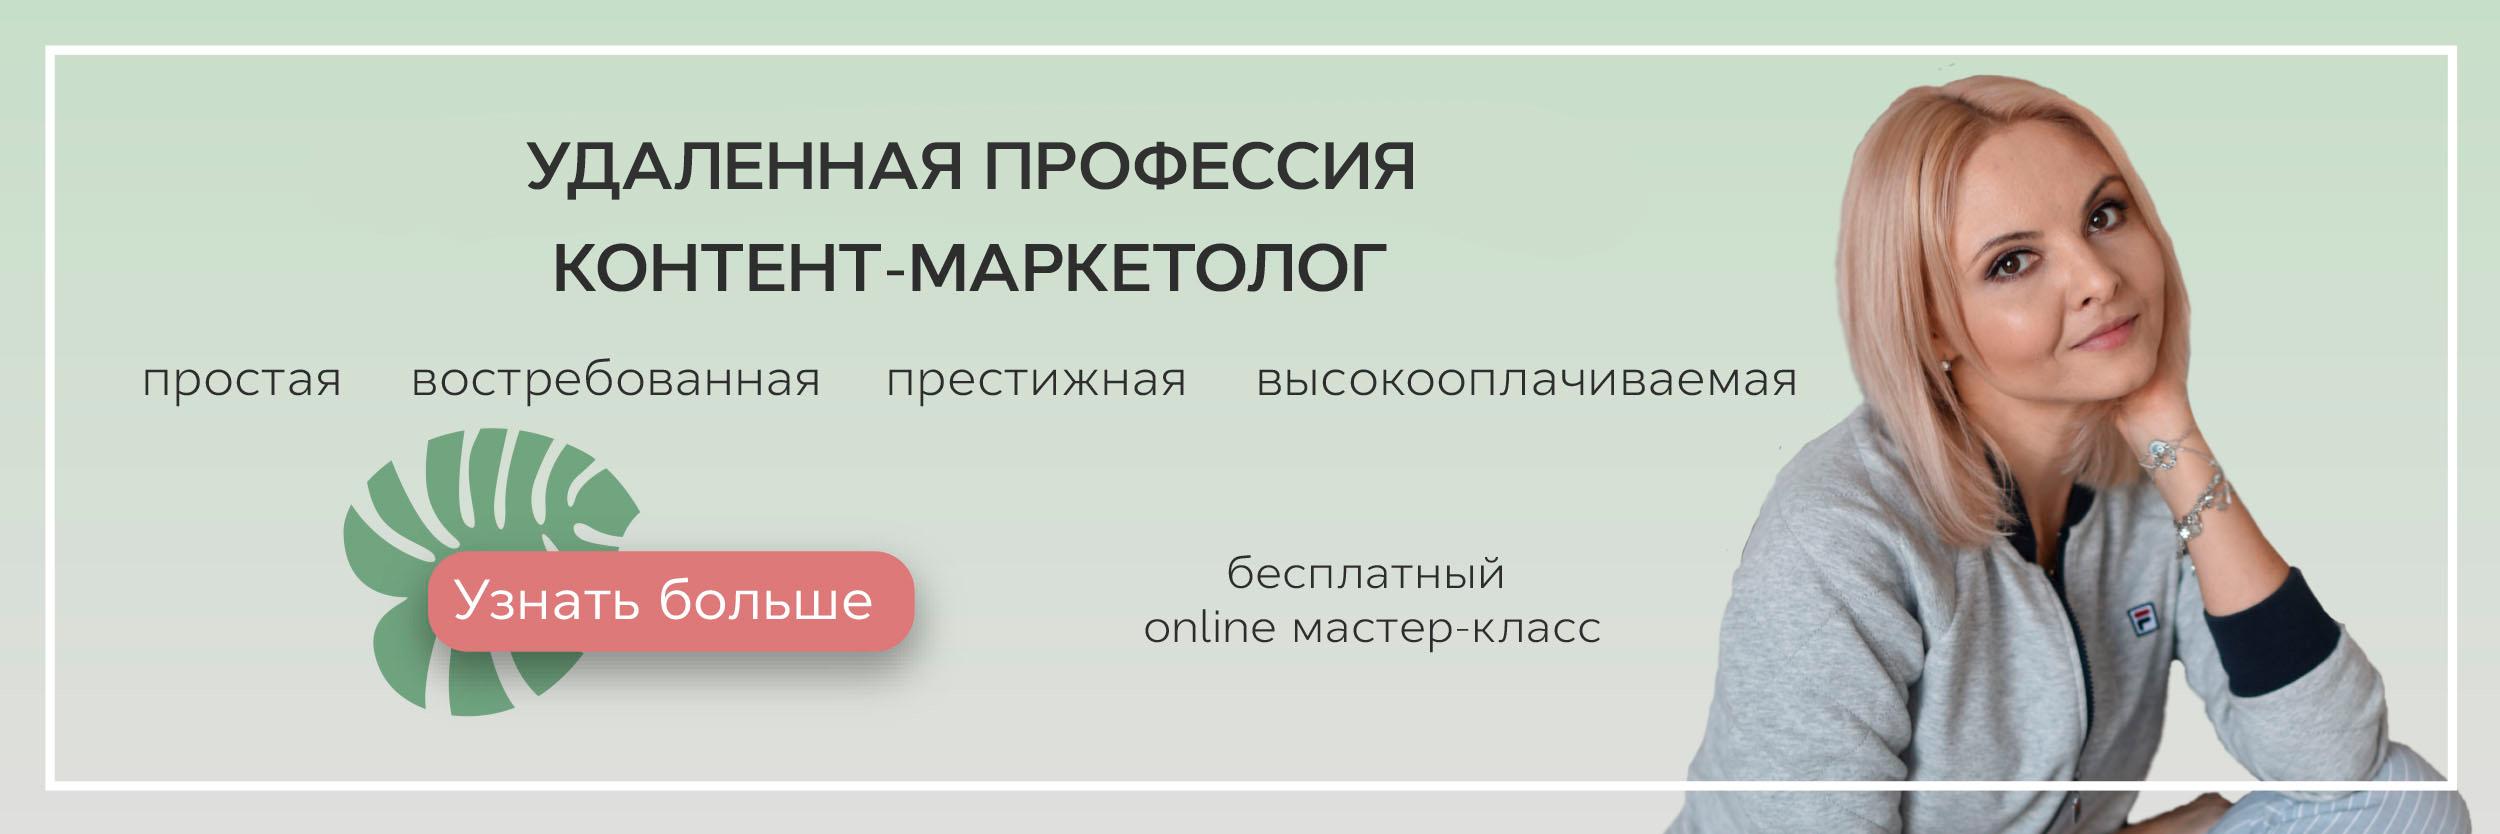 Профессия контент маркетолога